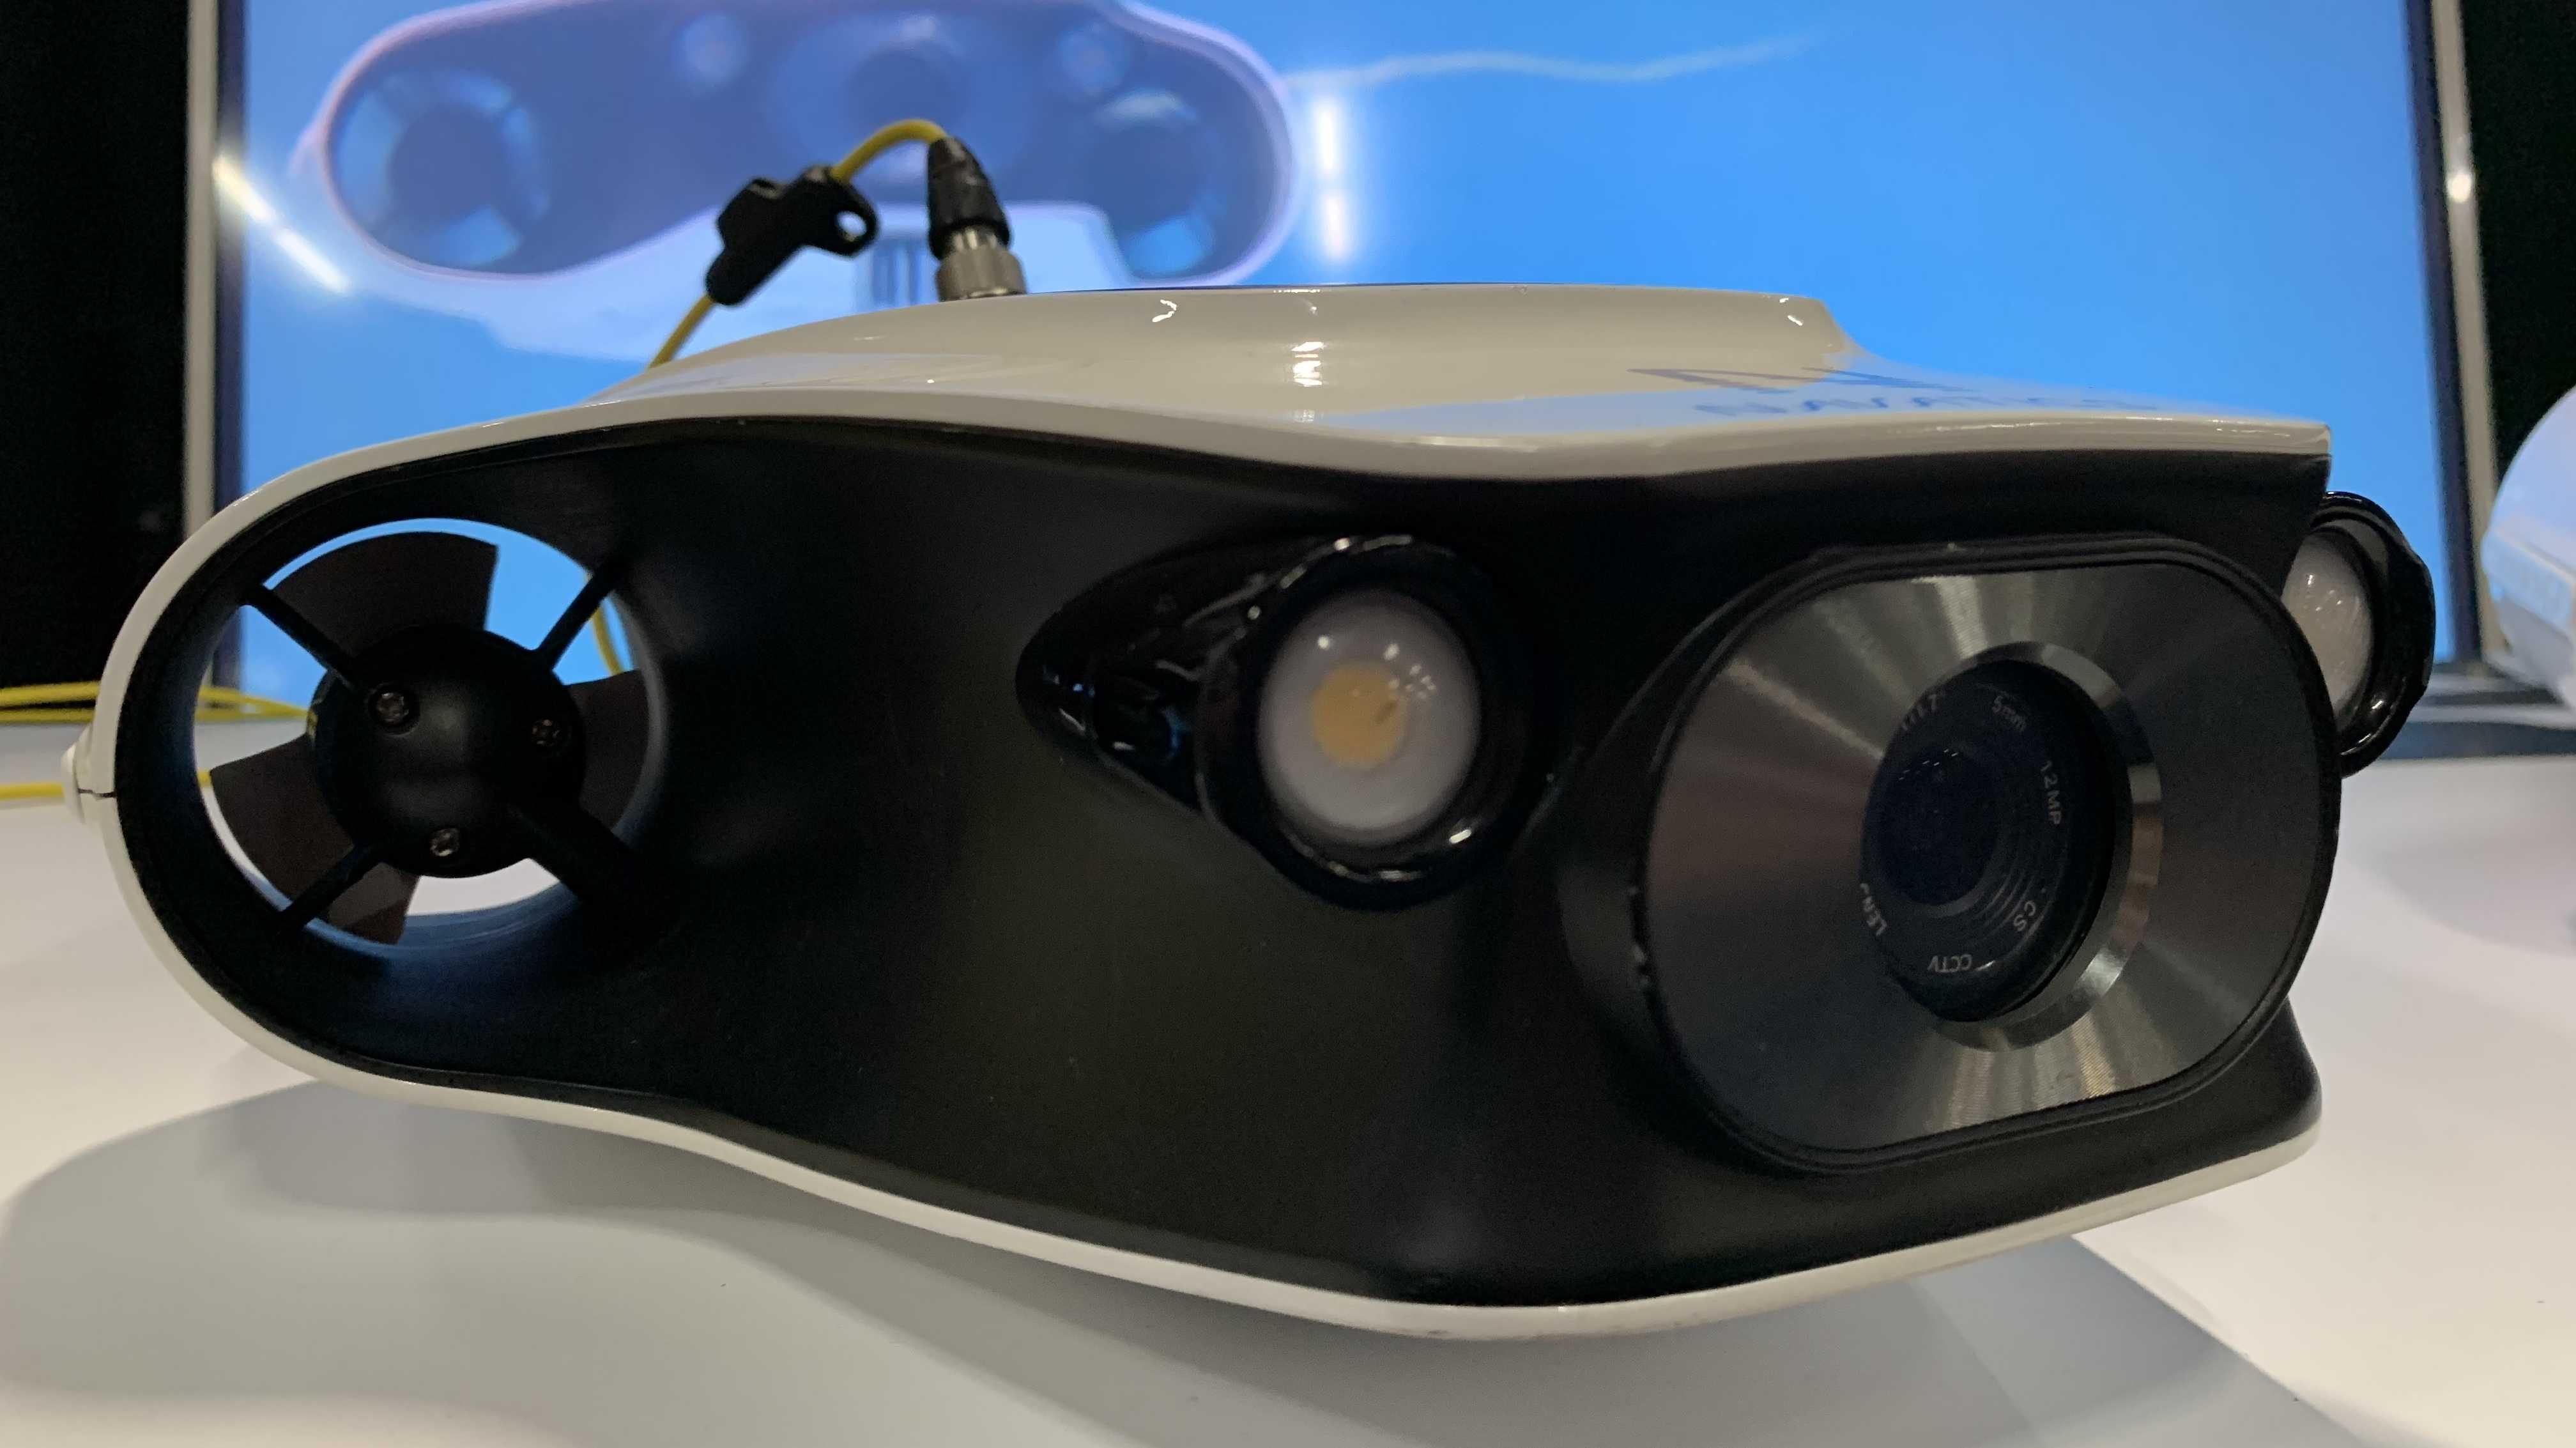 Navatics Mito: Drohne zum Abtauchen